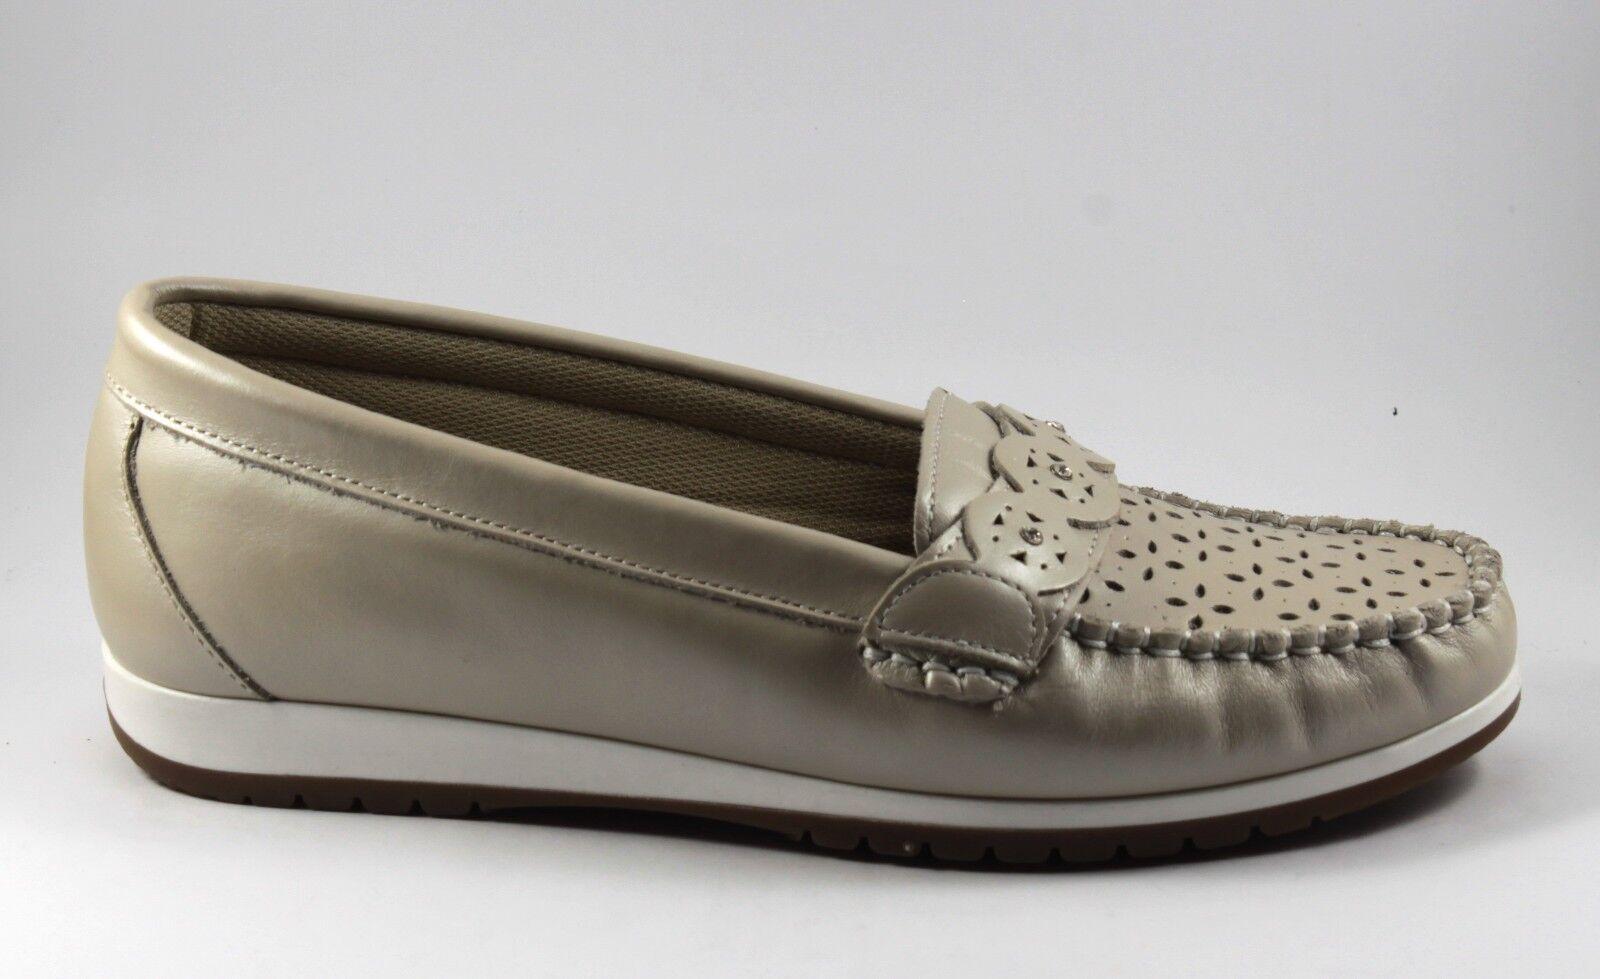 MOCASSINI Schuhe Damens SNEAKERS  IN PELLE n. COLORE AVORIO MORBIDISSIME n. PELLE 36 607459